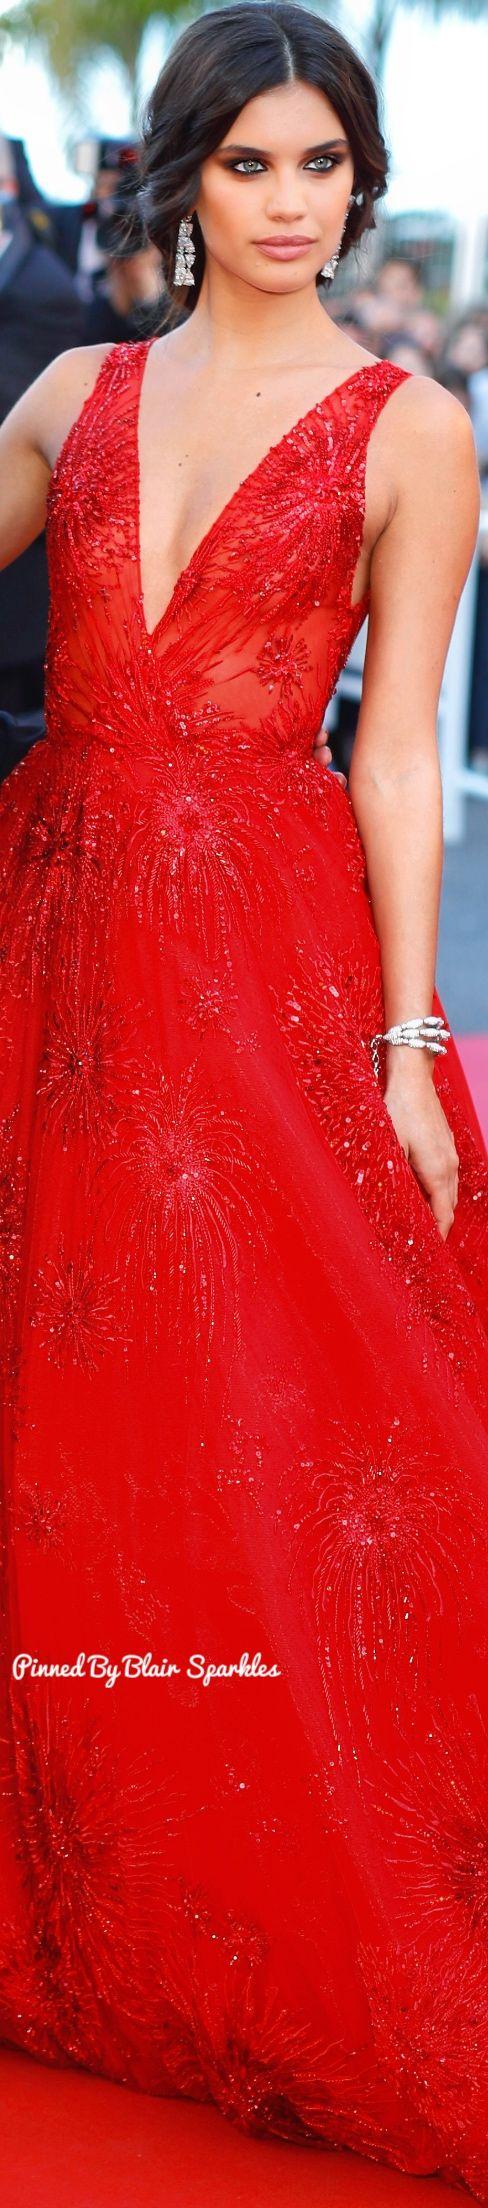 Sara Sampaio at Cannes 2017 ♕♚εїз | BLAIR SPARKLES |